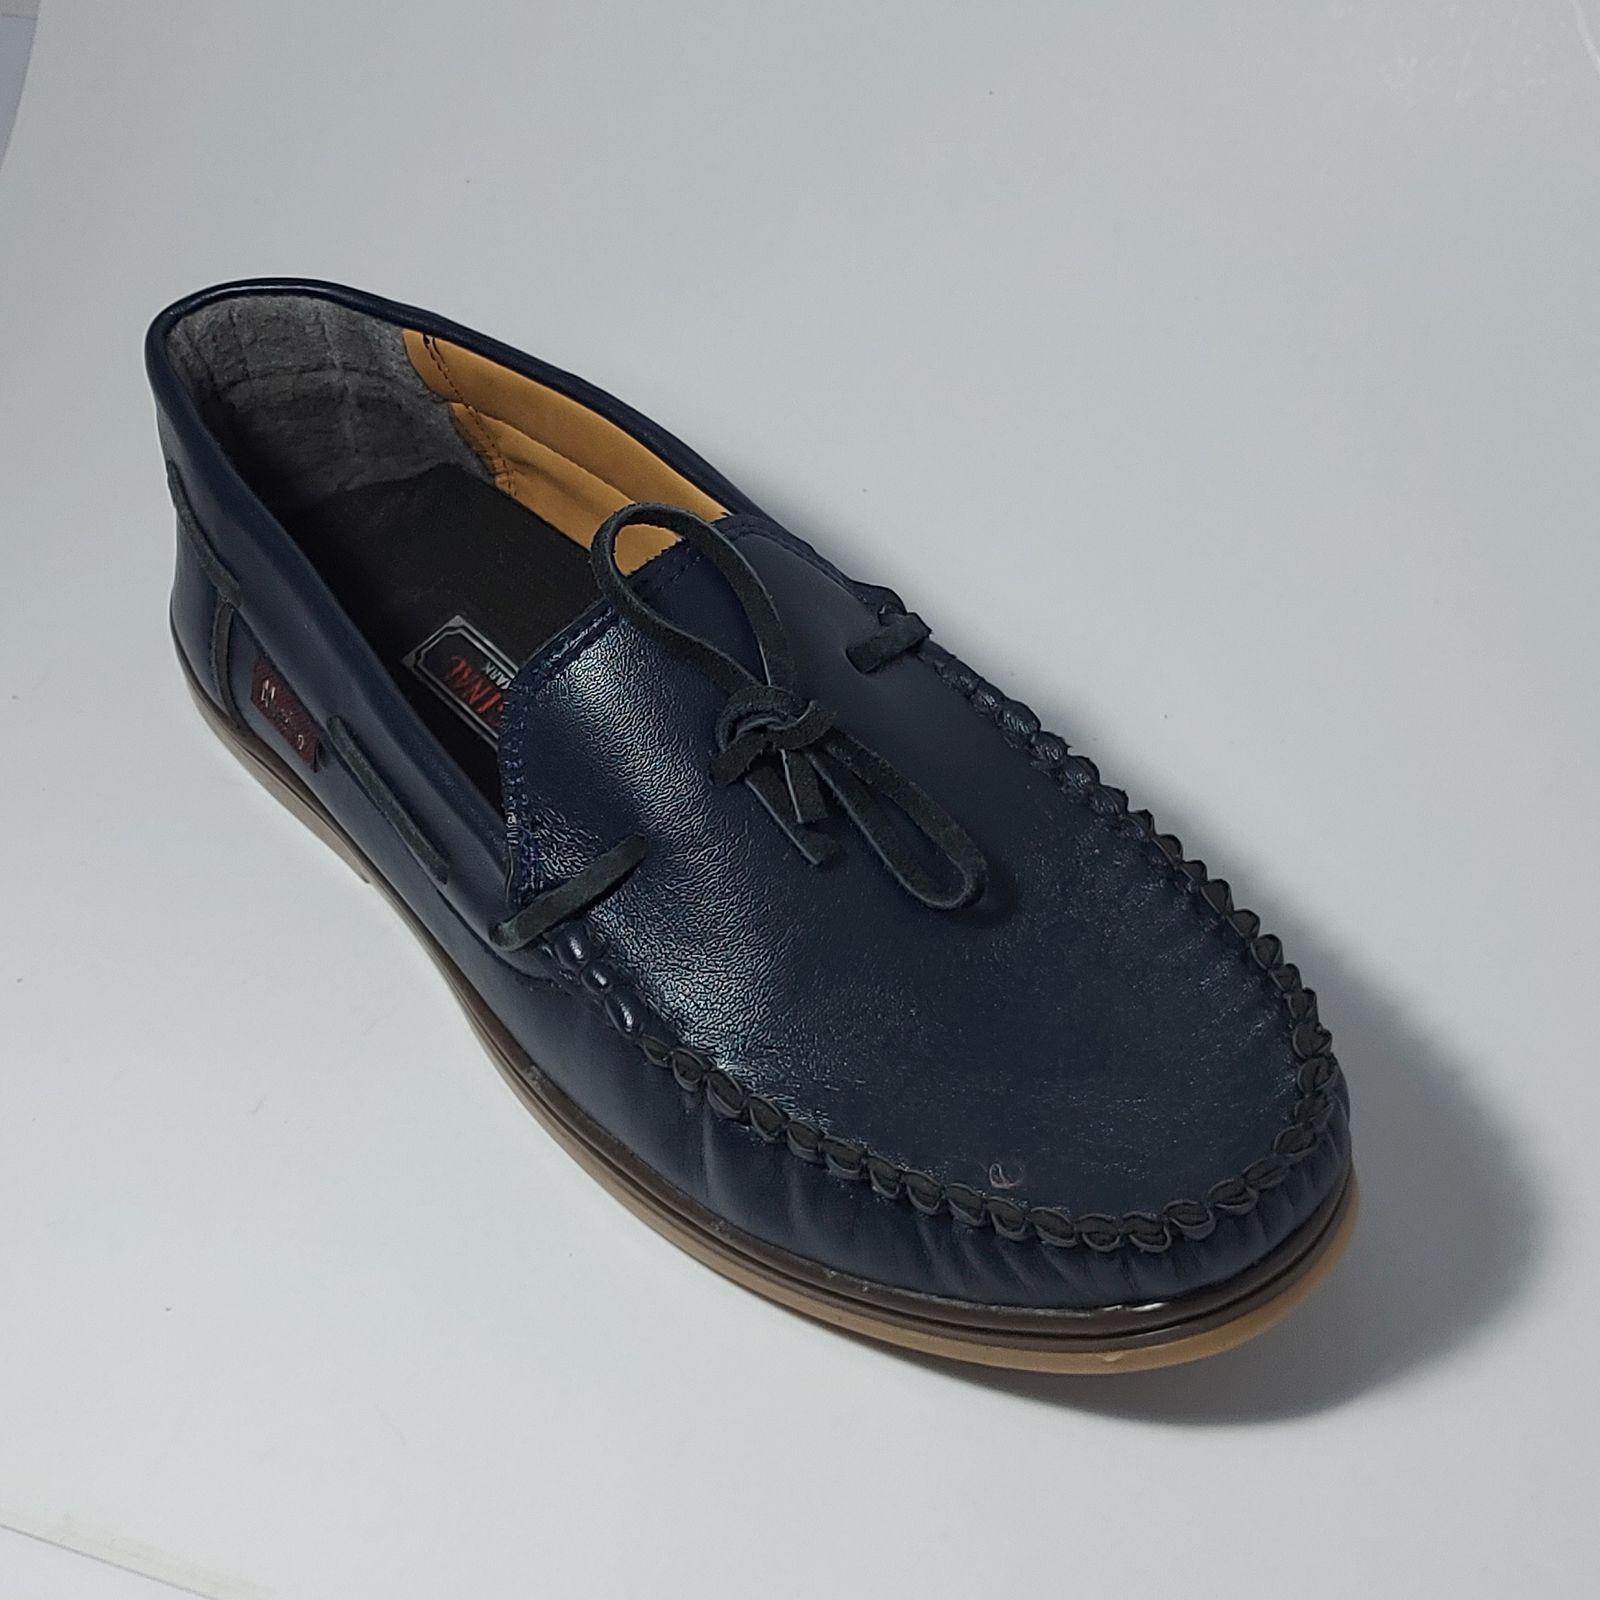 کفش روزمره مردانه مدل CH001 -  - 4